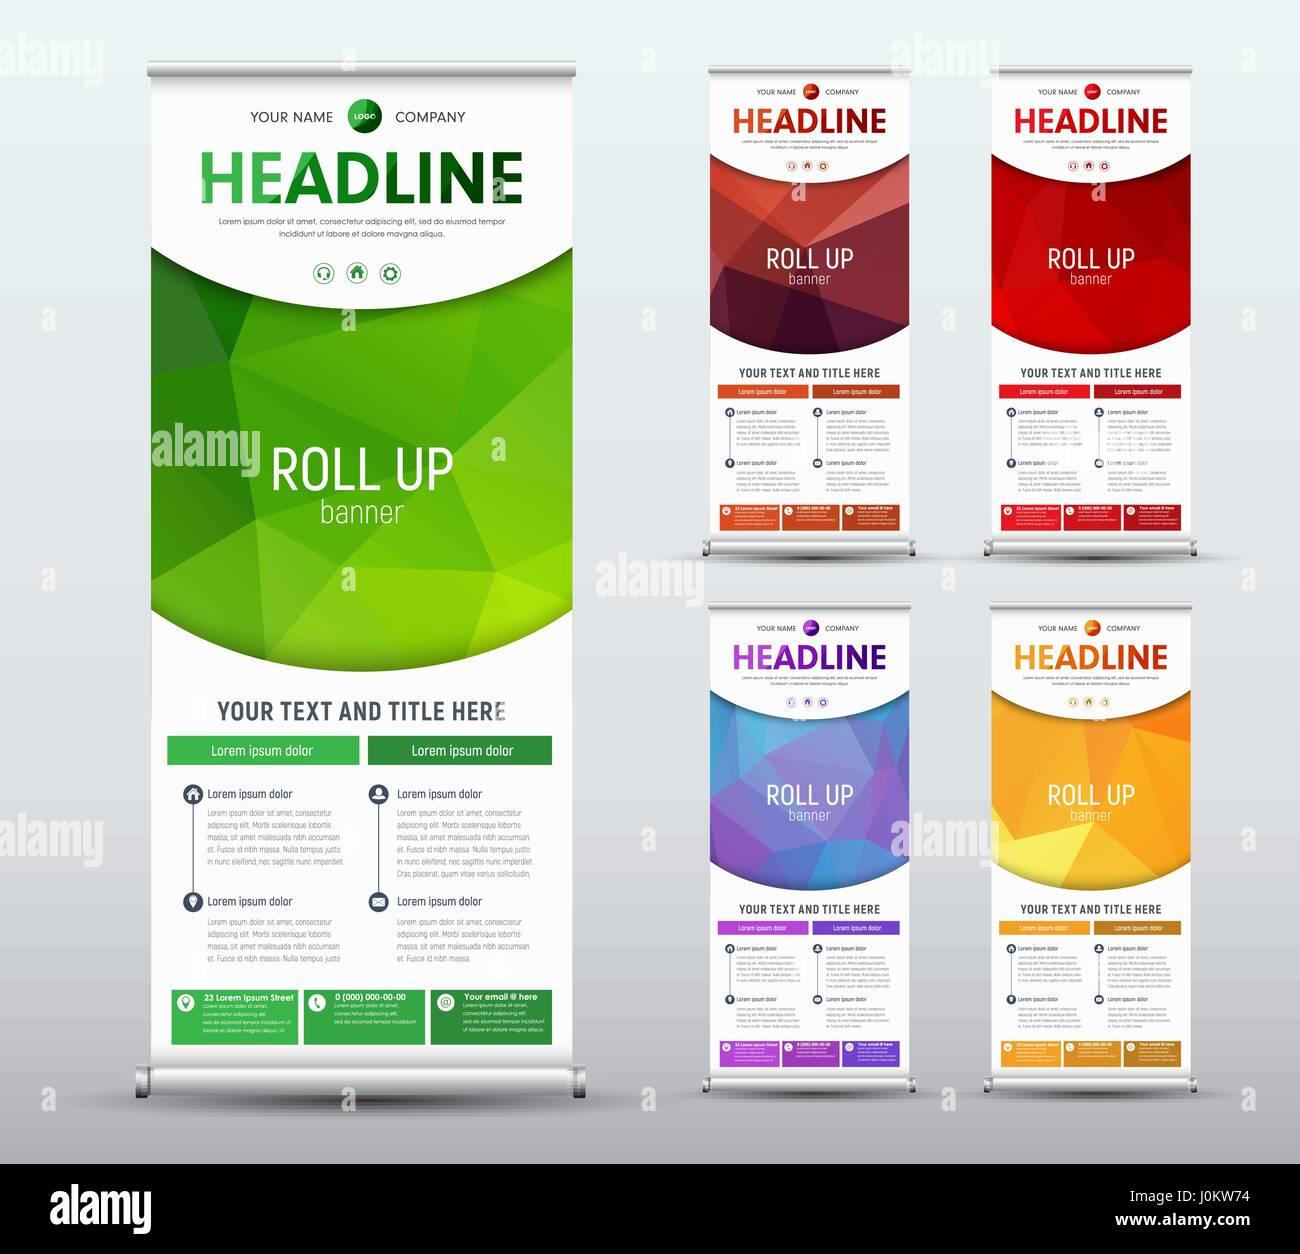 design roll up banner standard size template of a vertical brochure